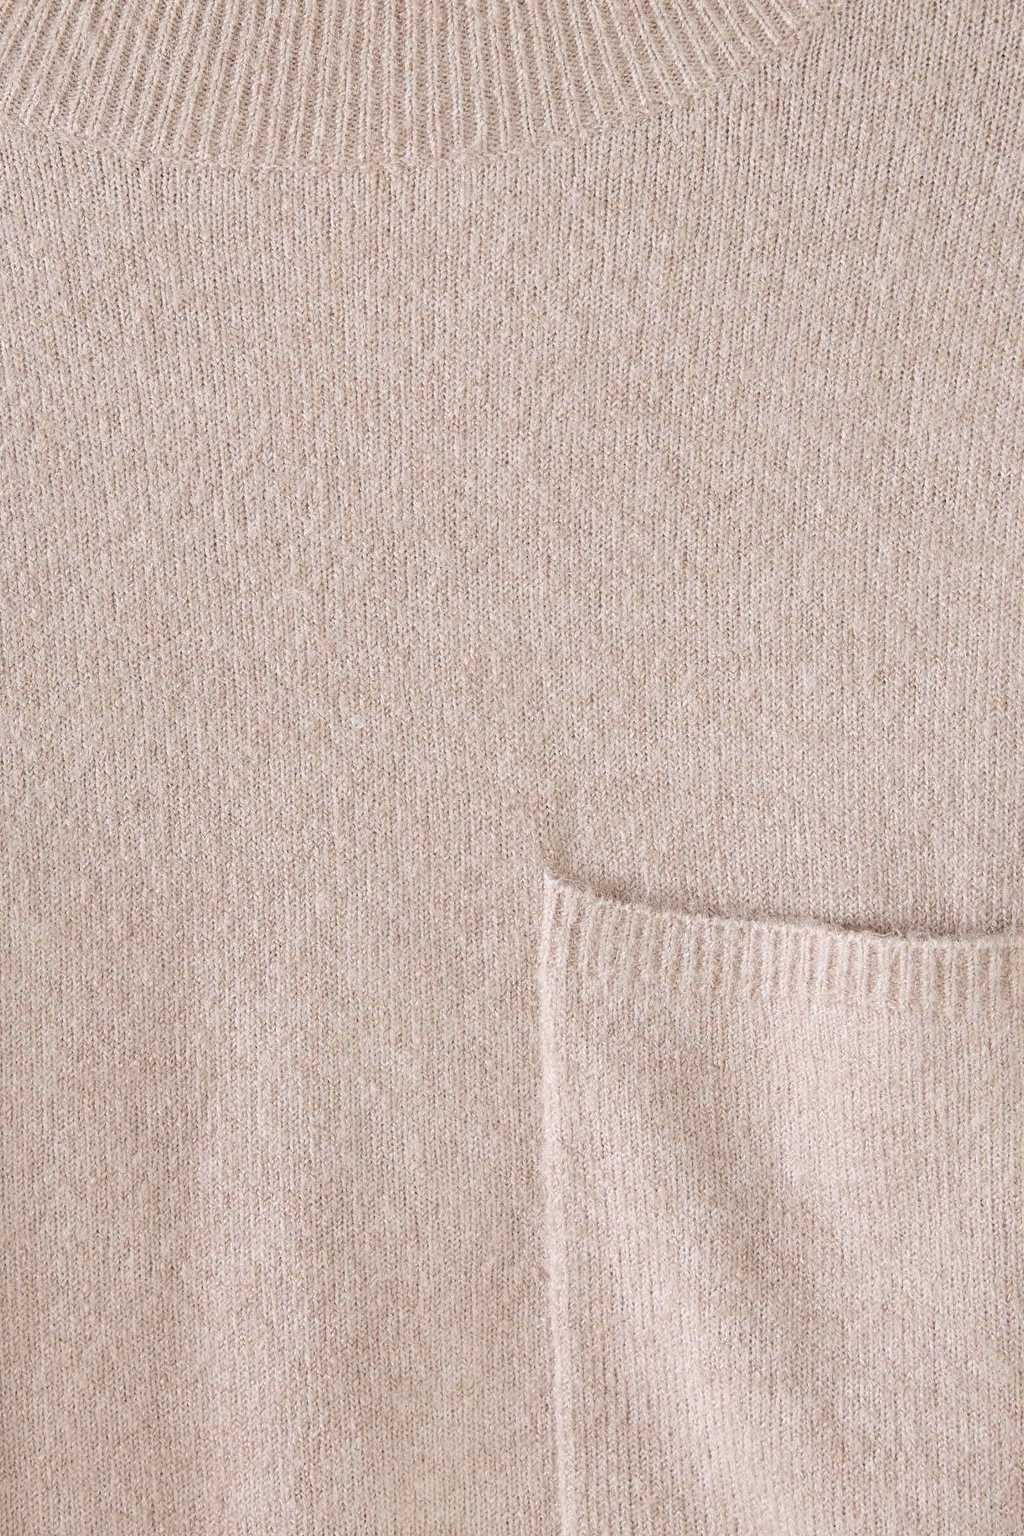 Sweater 2406 Beige 13